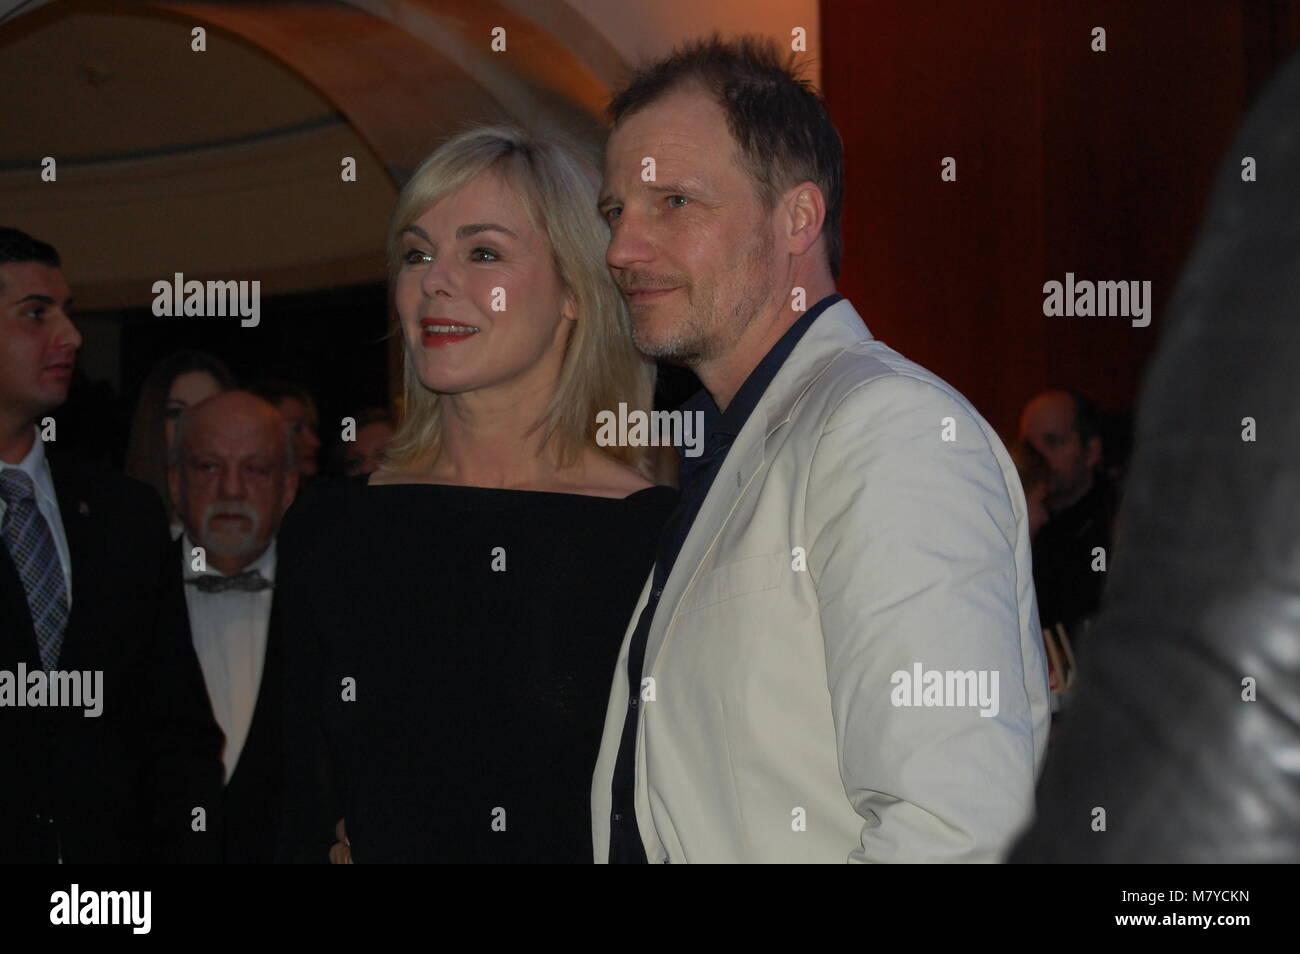 Saskia Valencia & Thorsten Nindel - Los Banditos-Party im Hotel ADLON Kempinski - 10.02.2013 Berlinale 2013 - Stock Image